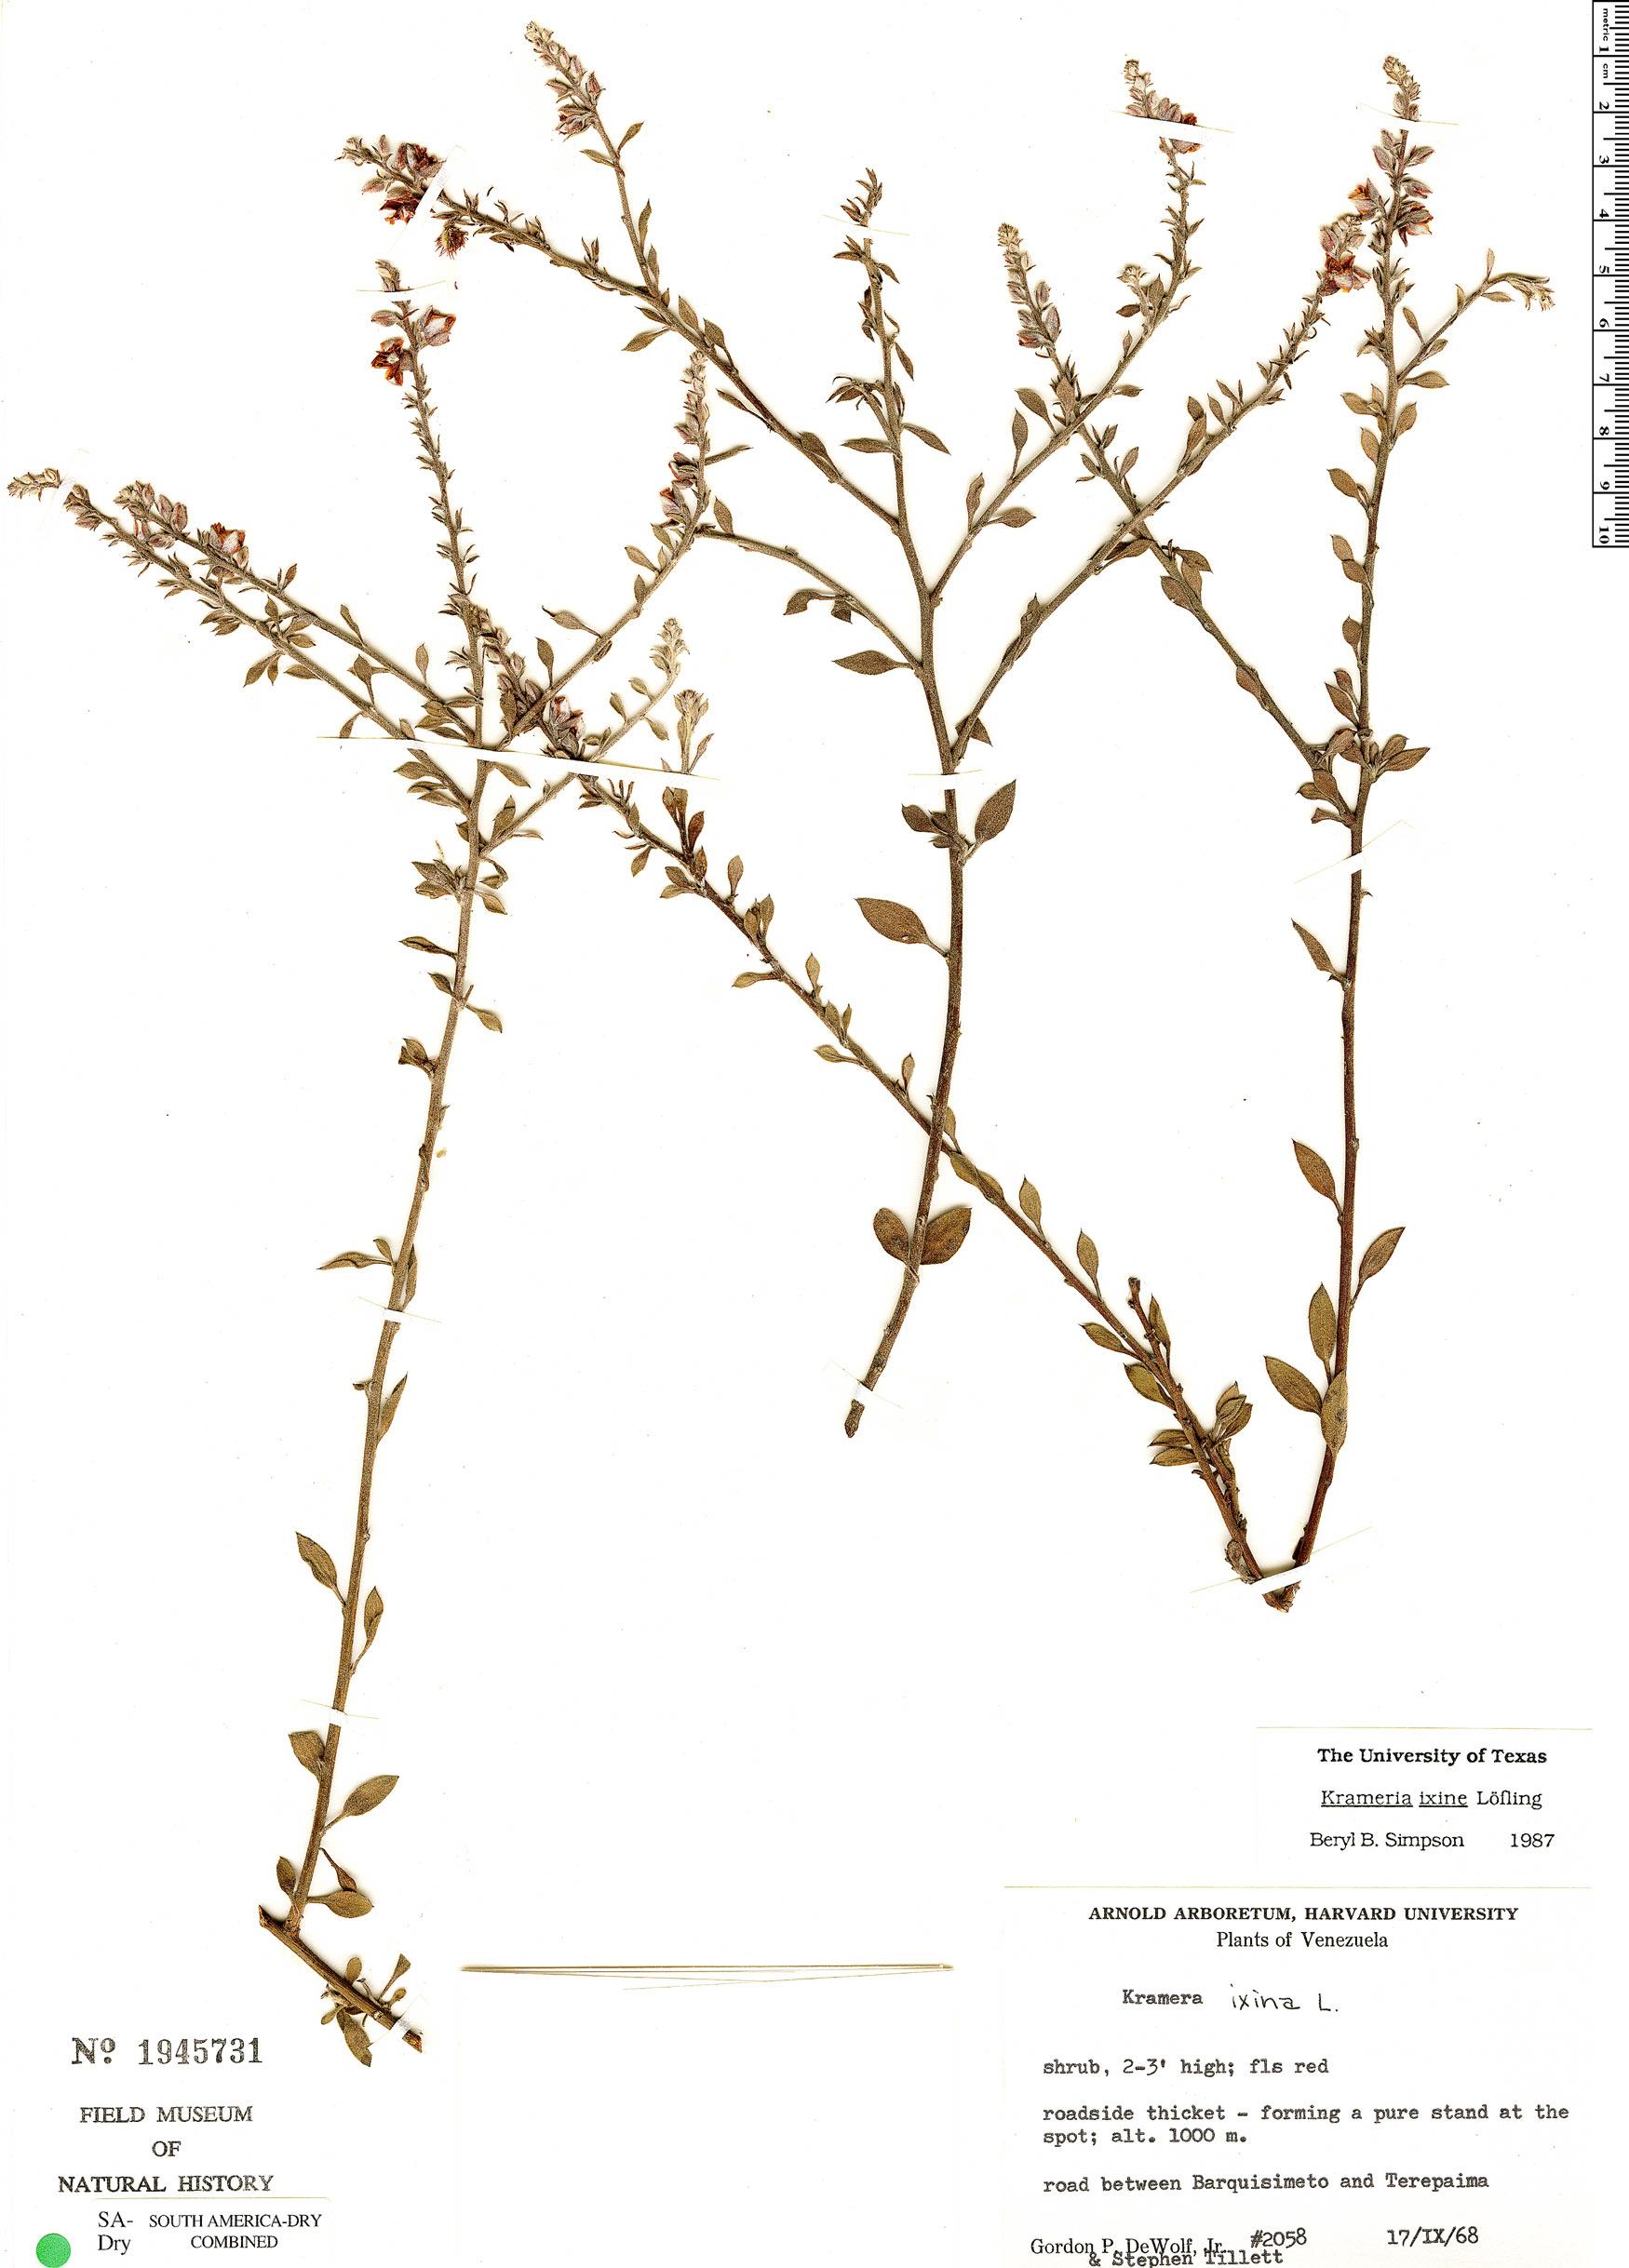 Specimen: Krameria ixine